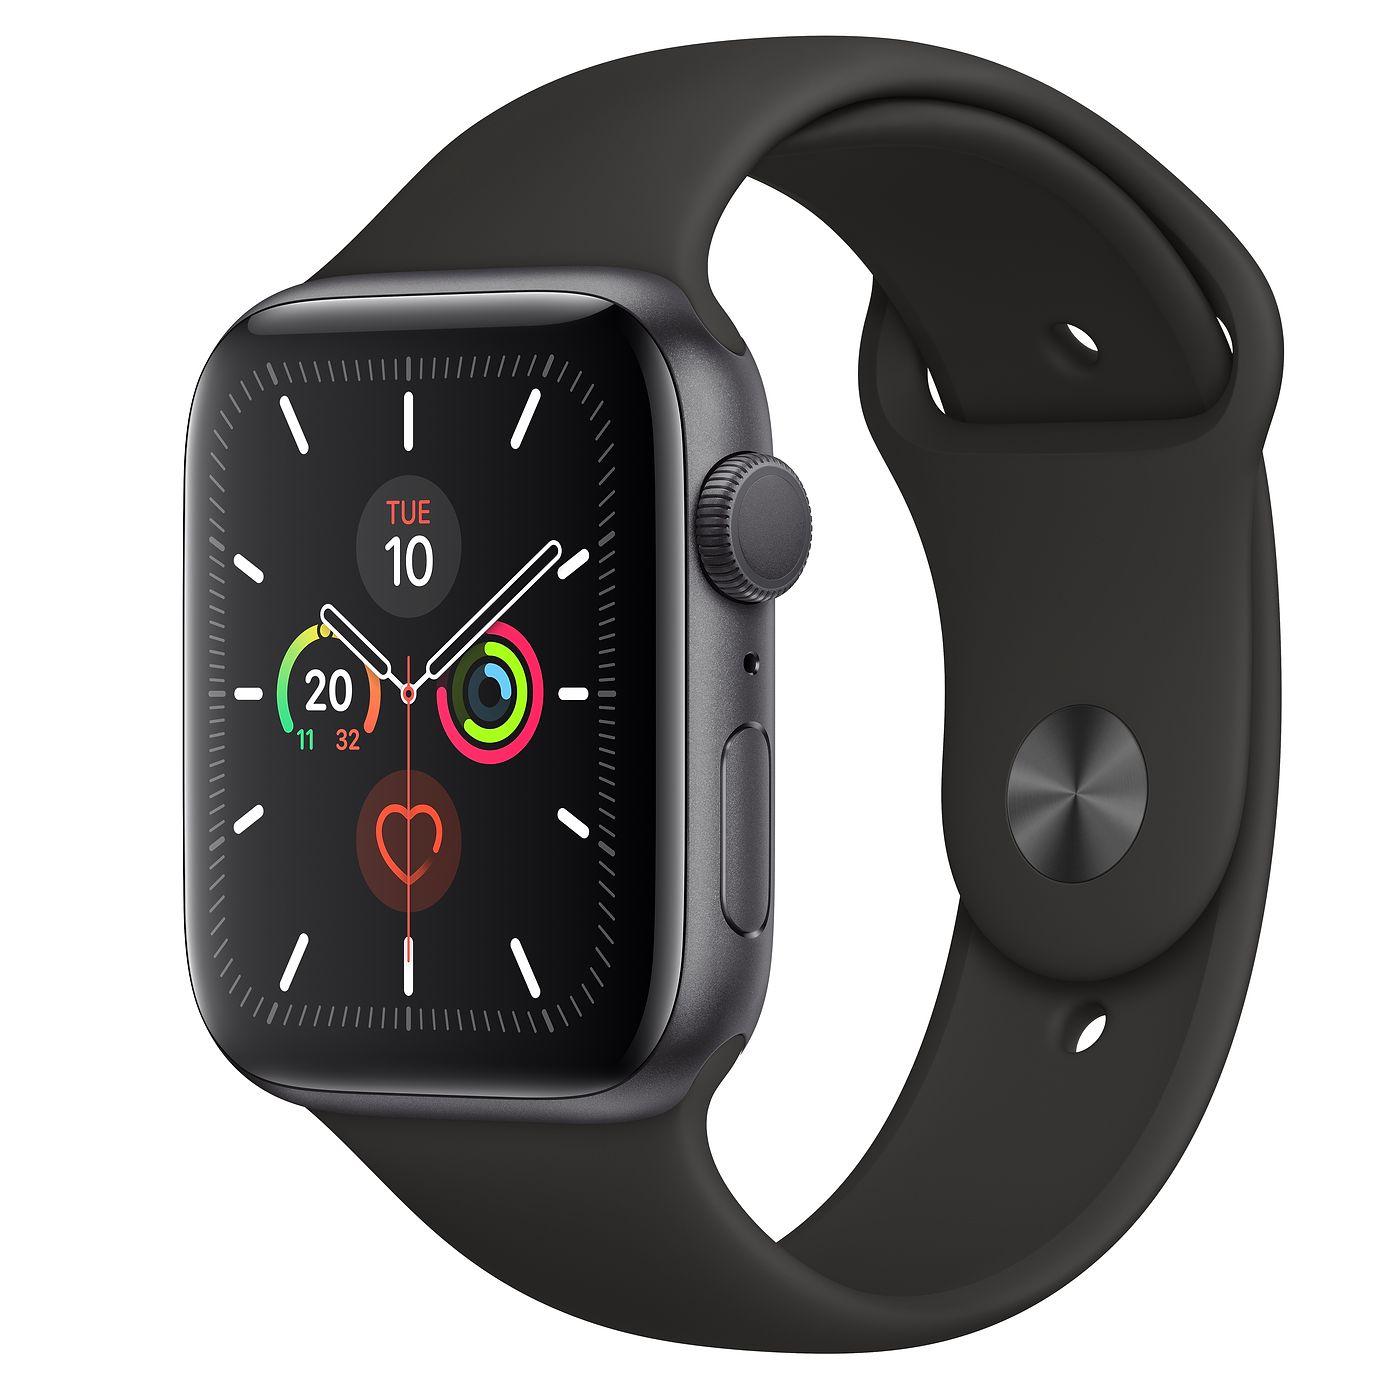 Montre connectée Apple Watch Series 5 GPS 44mm - Space Grey